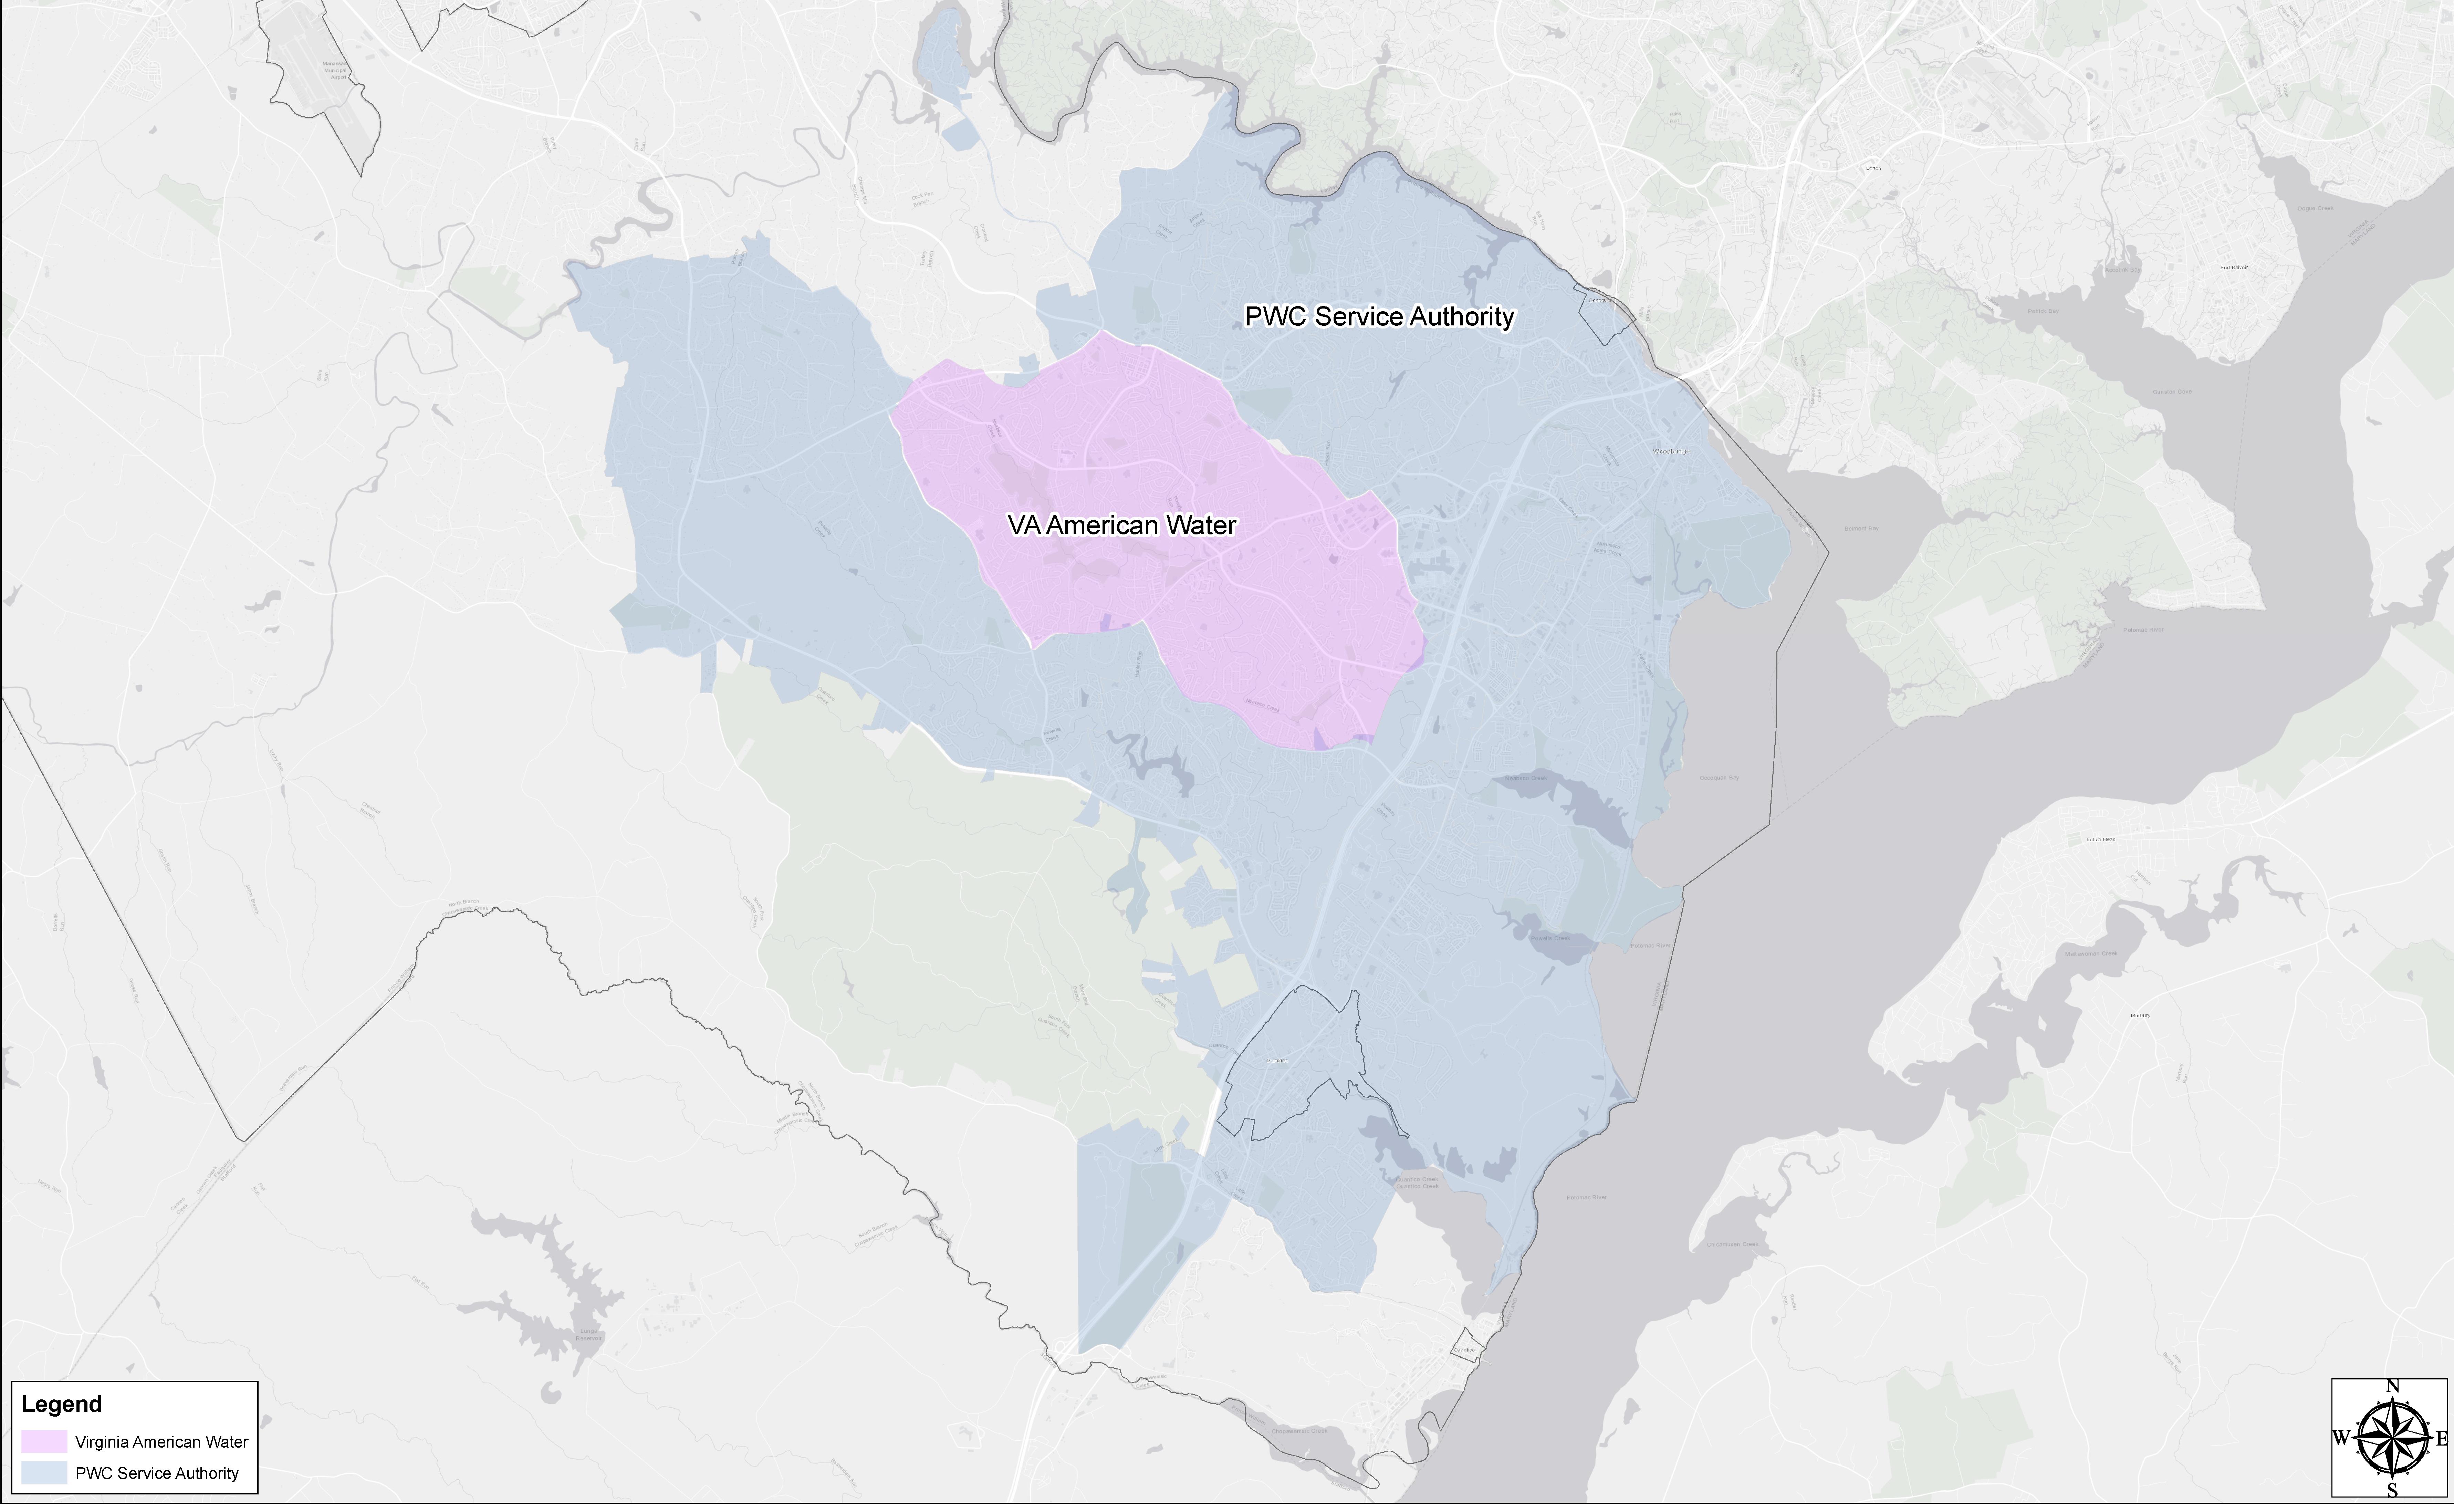 2/26/19: Fairfax Water To Repair Water Main Impacting Dale City Water Customers